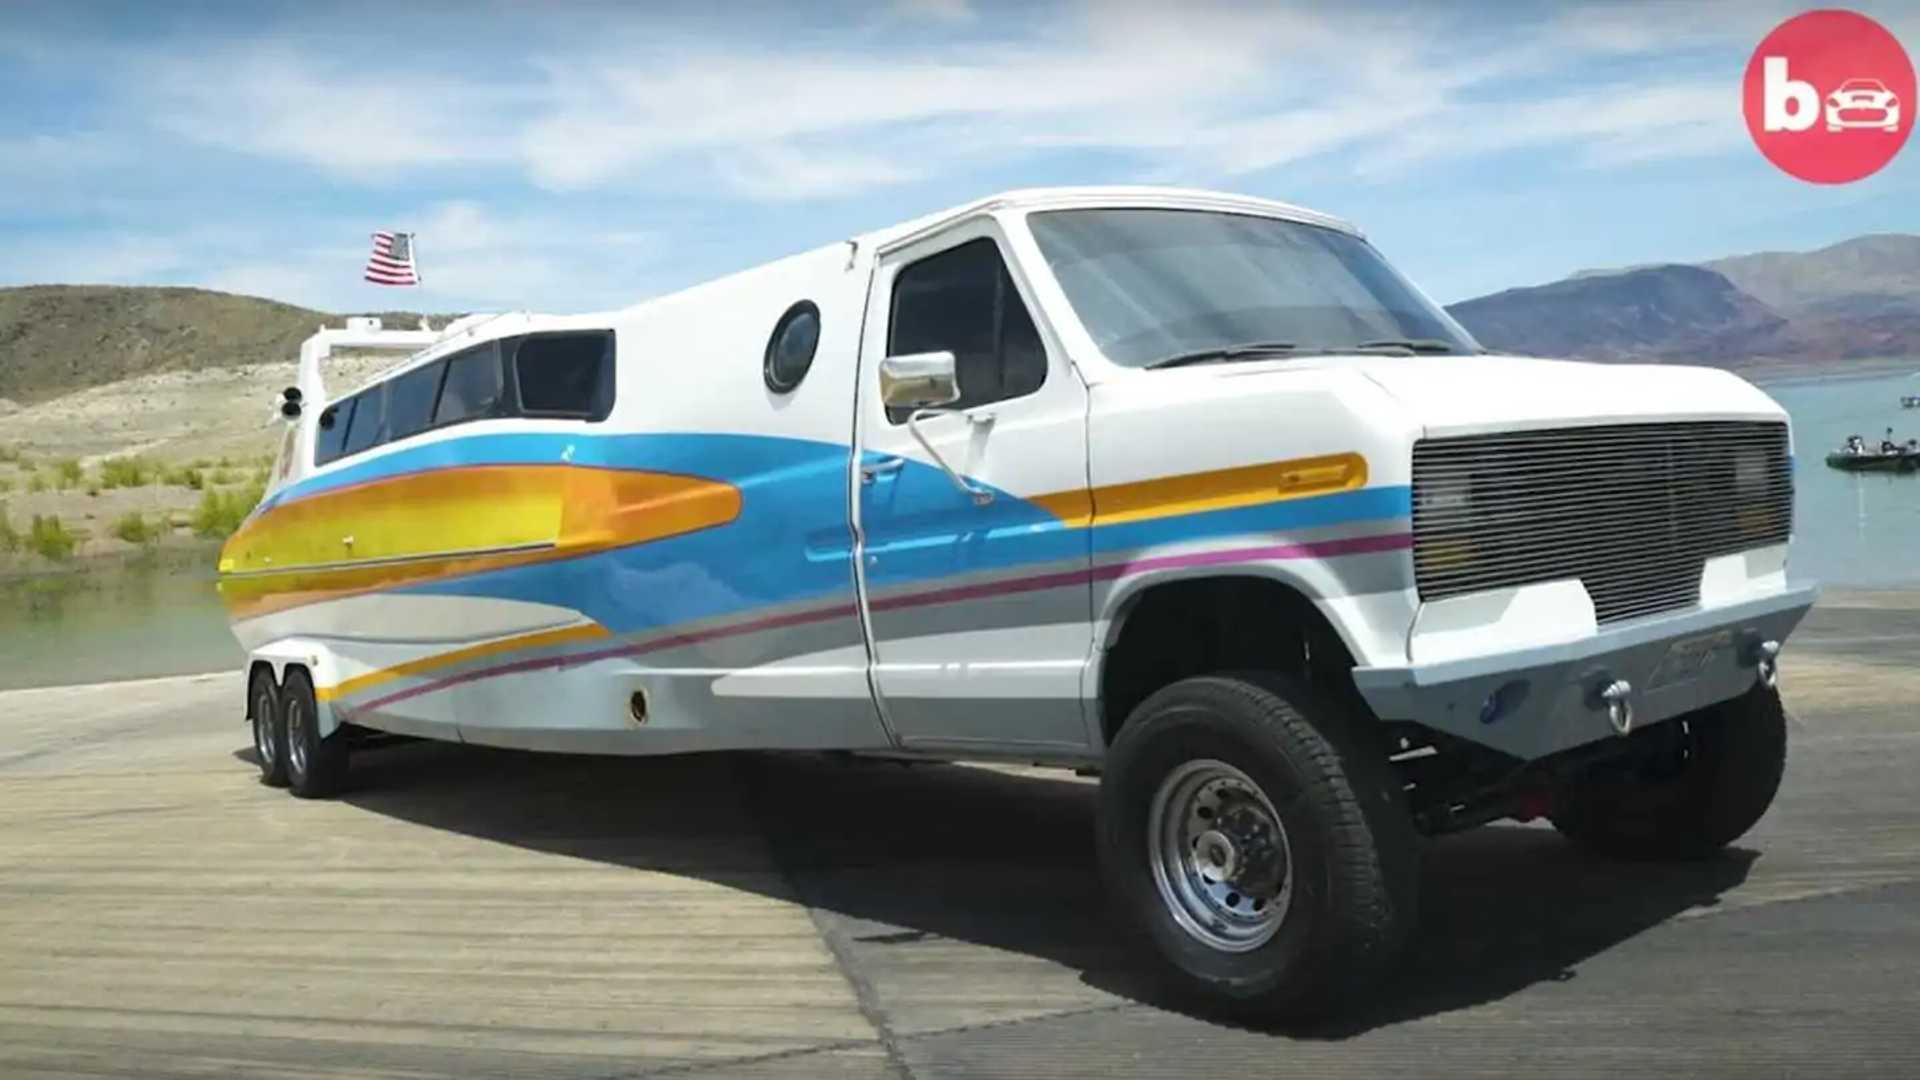 Boaterhome Is A Ludicrous Half Van, Half Boat Contraption